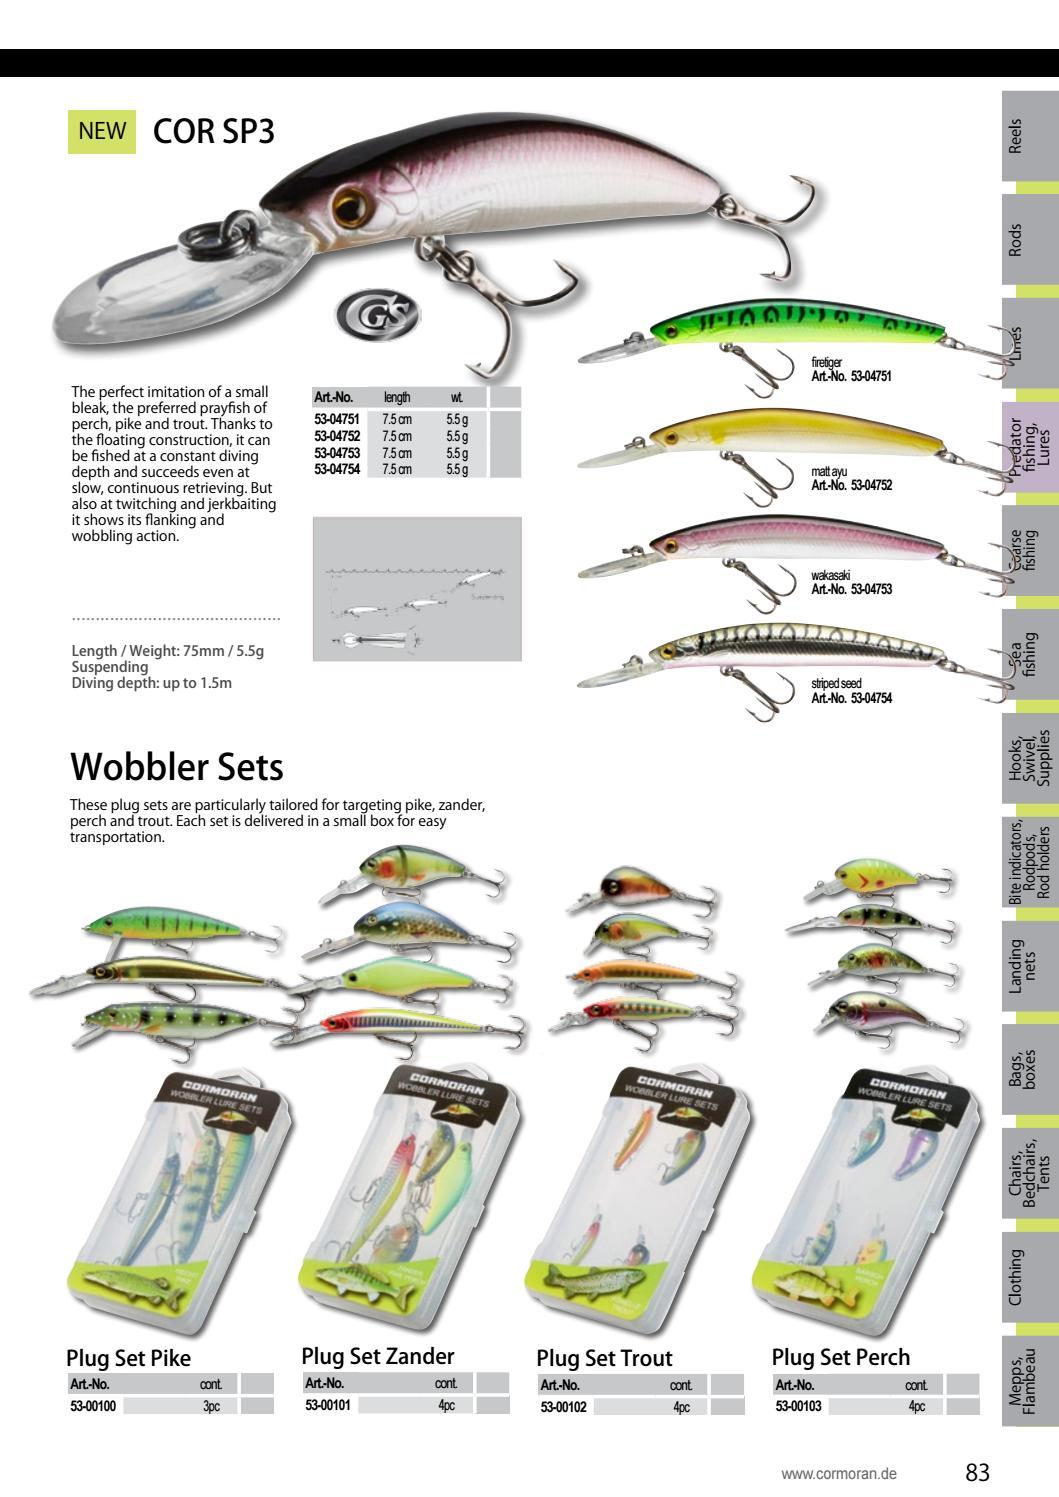 53-00101 Cormoran Wobbler Set Zander